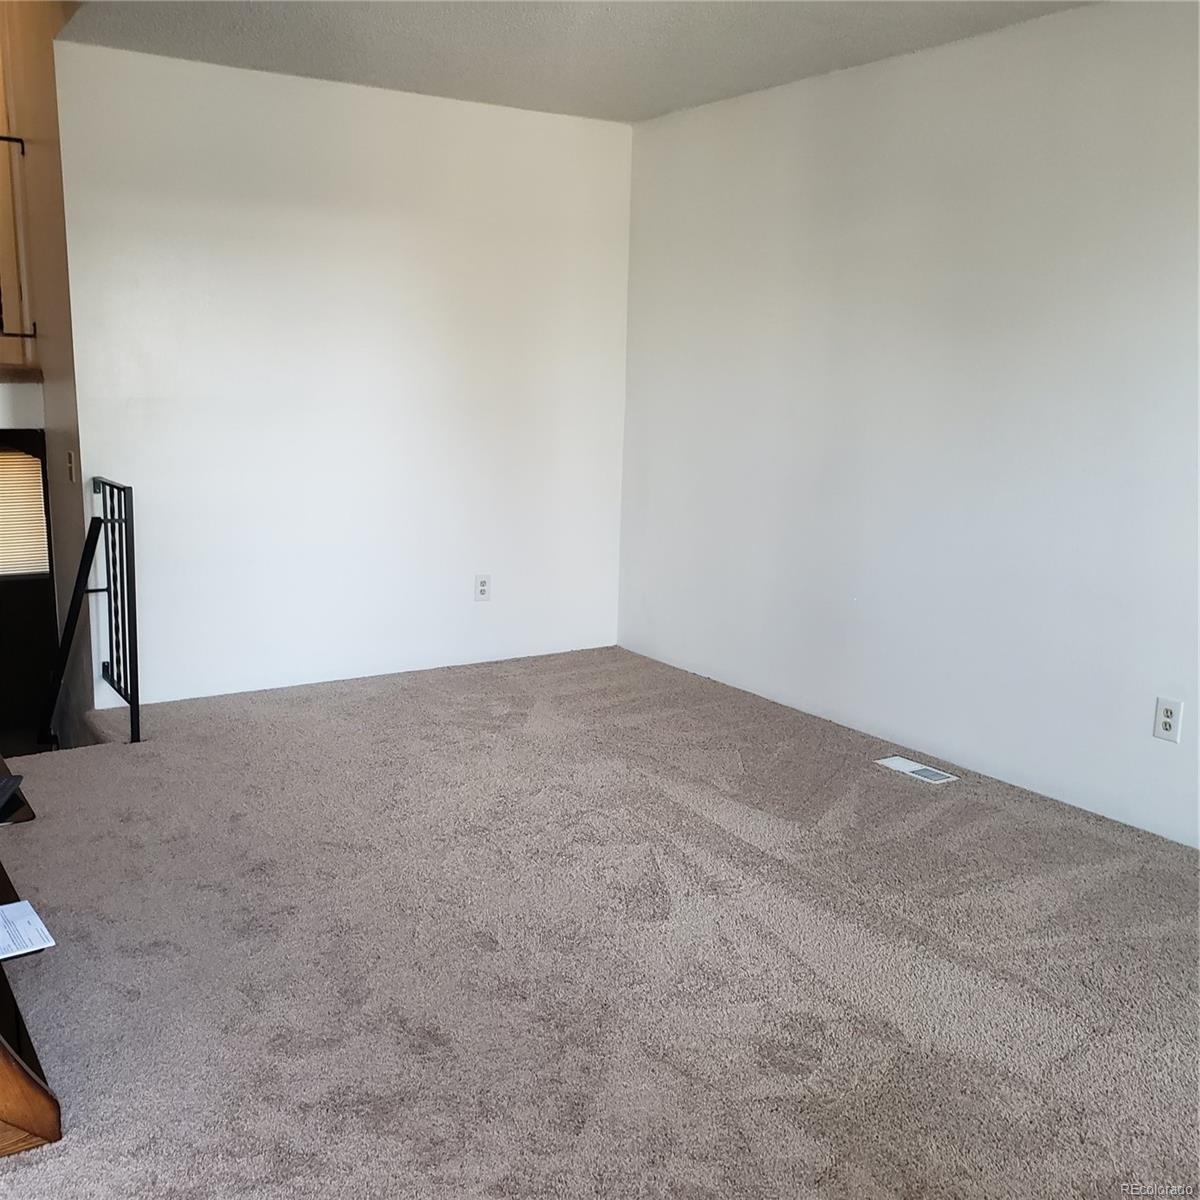 MLS# 9648925 - 1 - 20765  E Buchanan Drive, Aurora, CO 80011